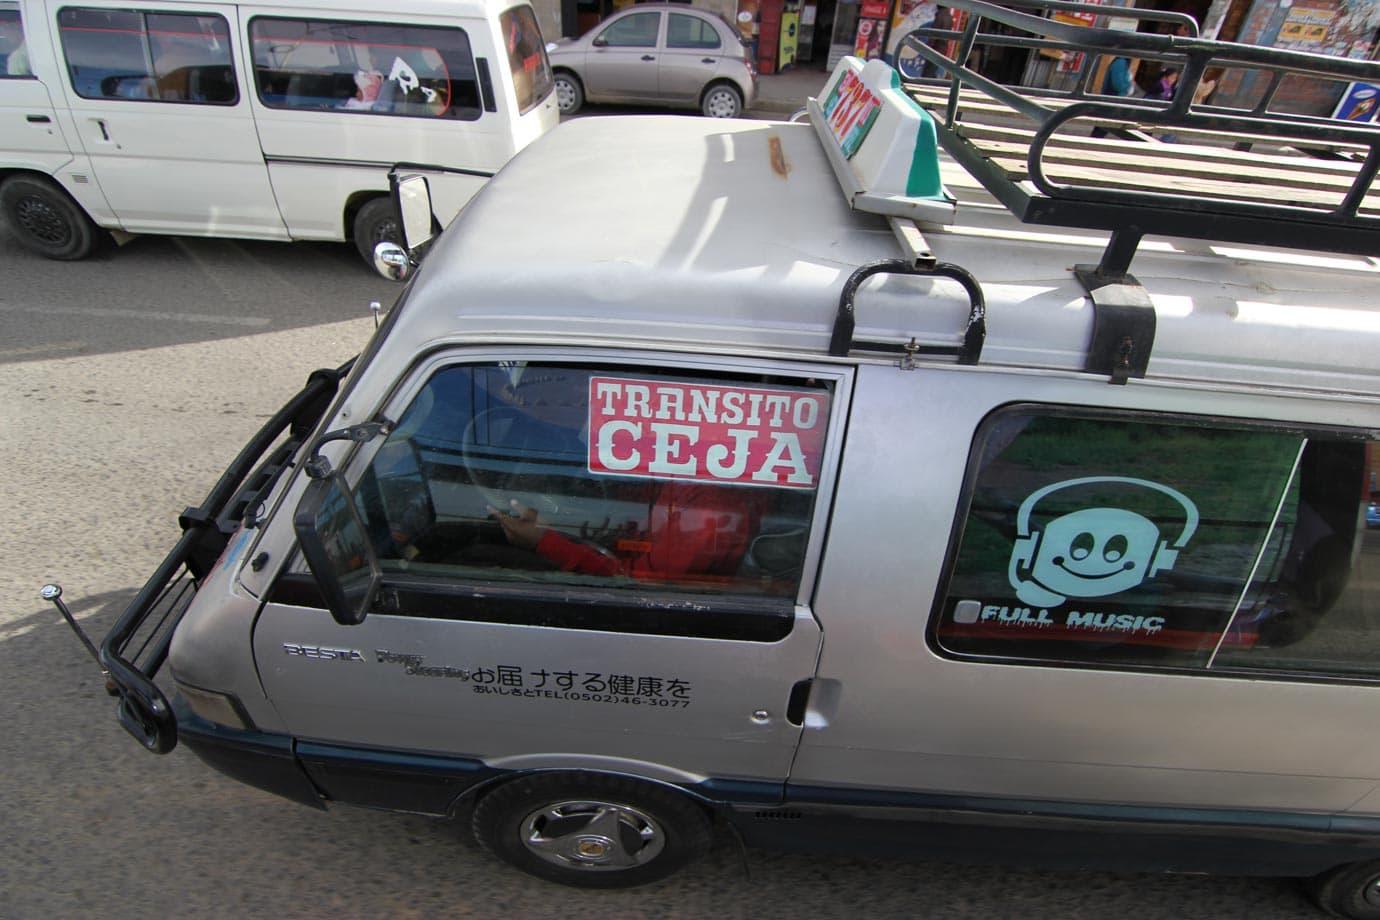 Tourist buses are actually 15 seat vans - ©Macca Sherifi